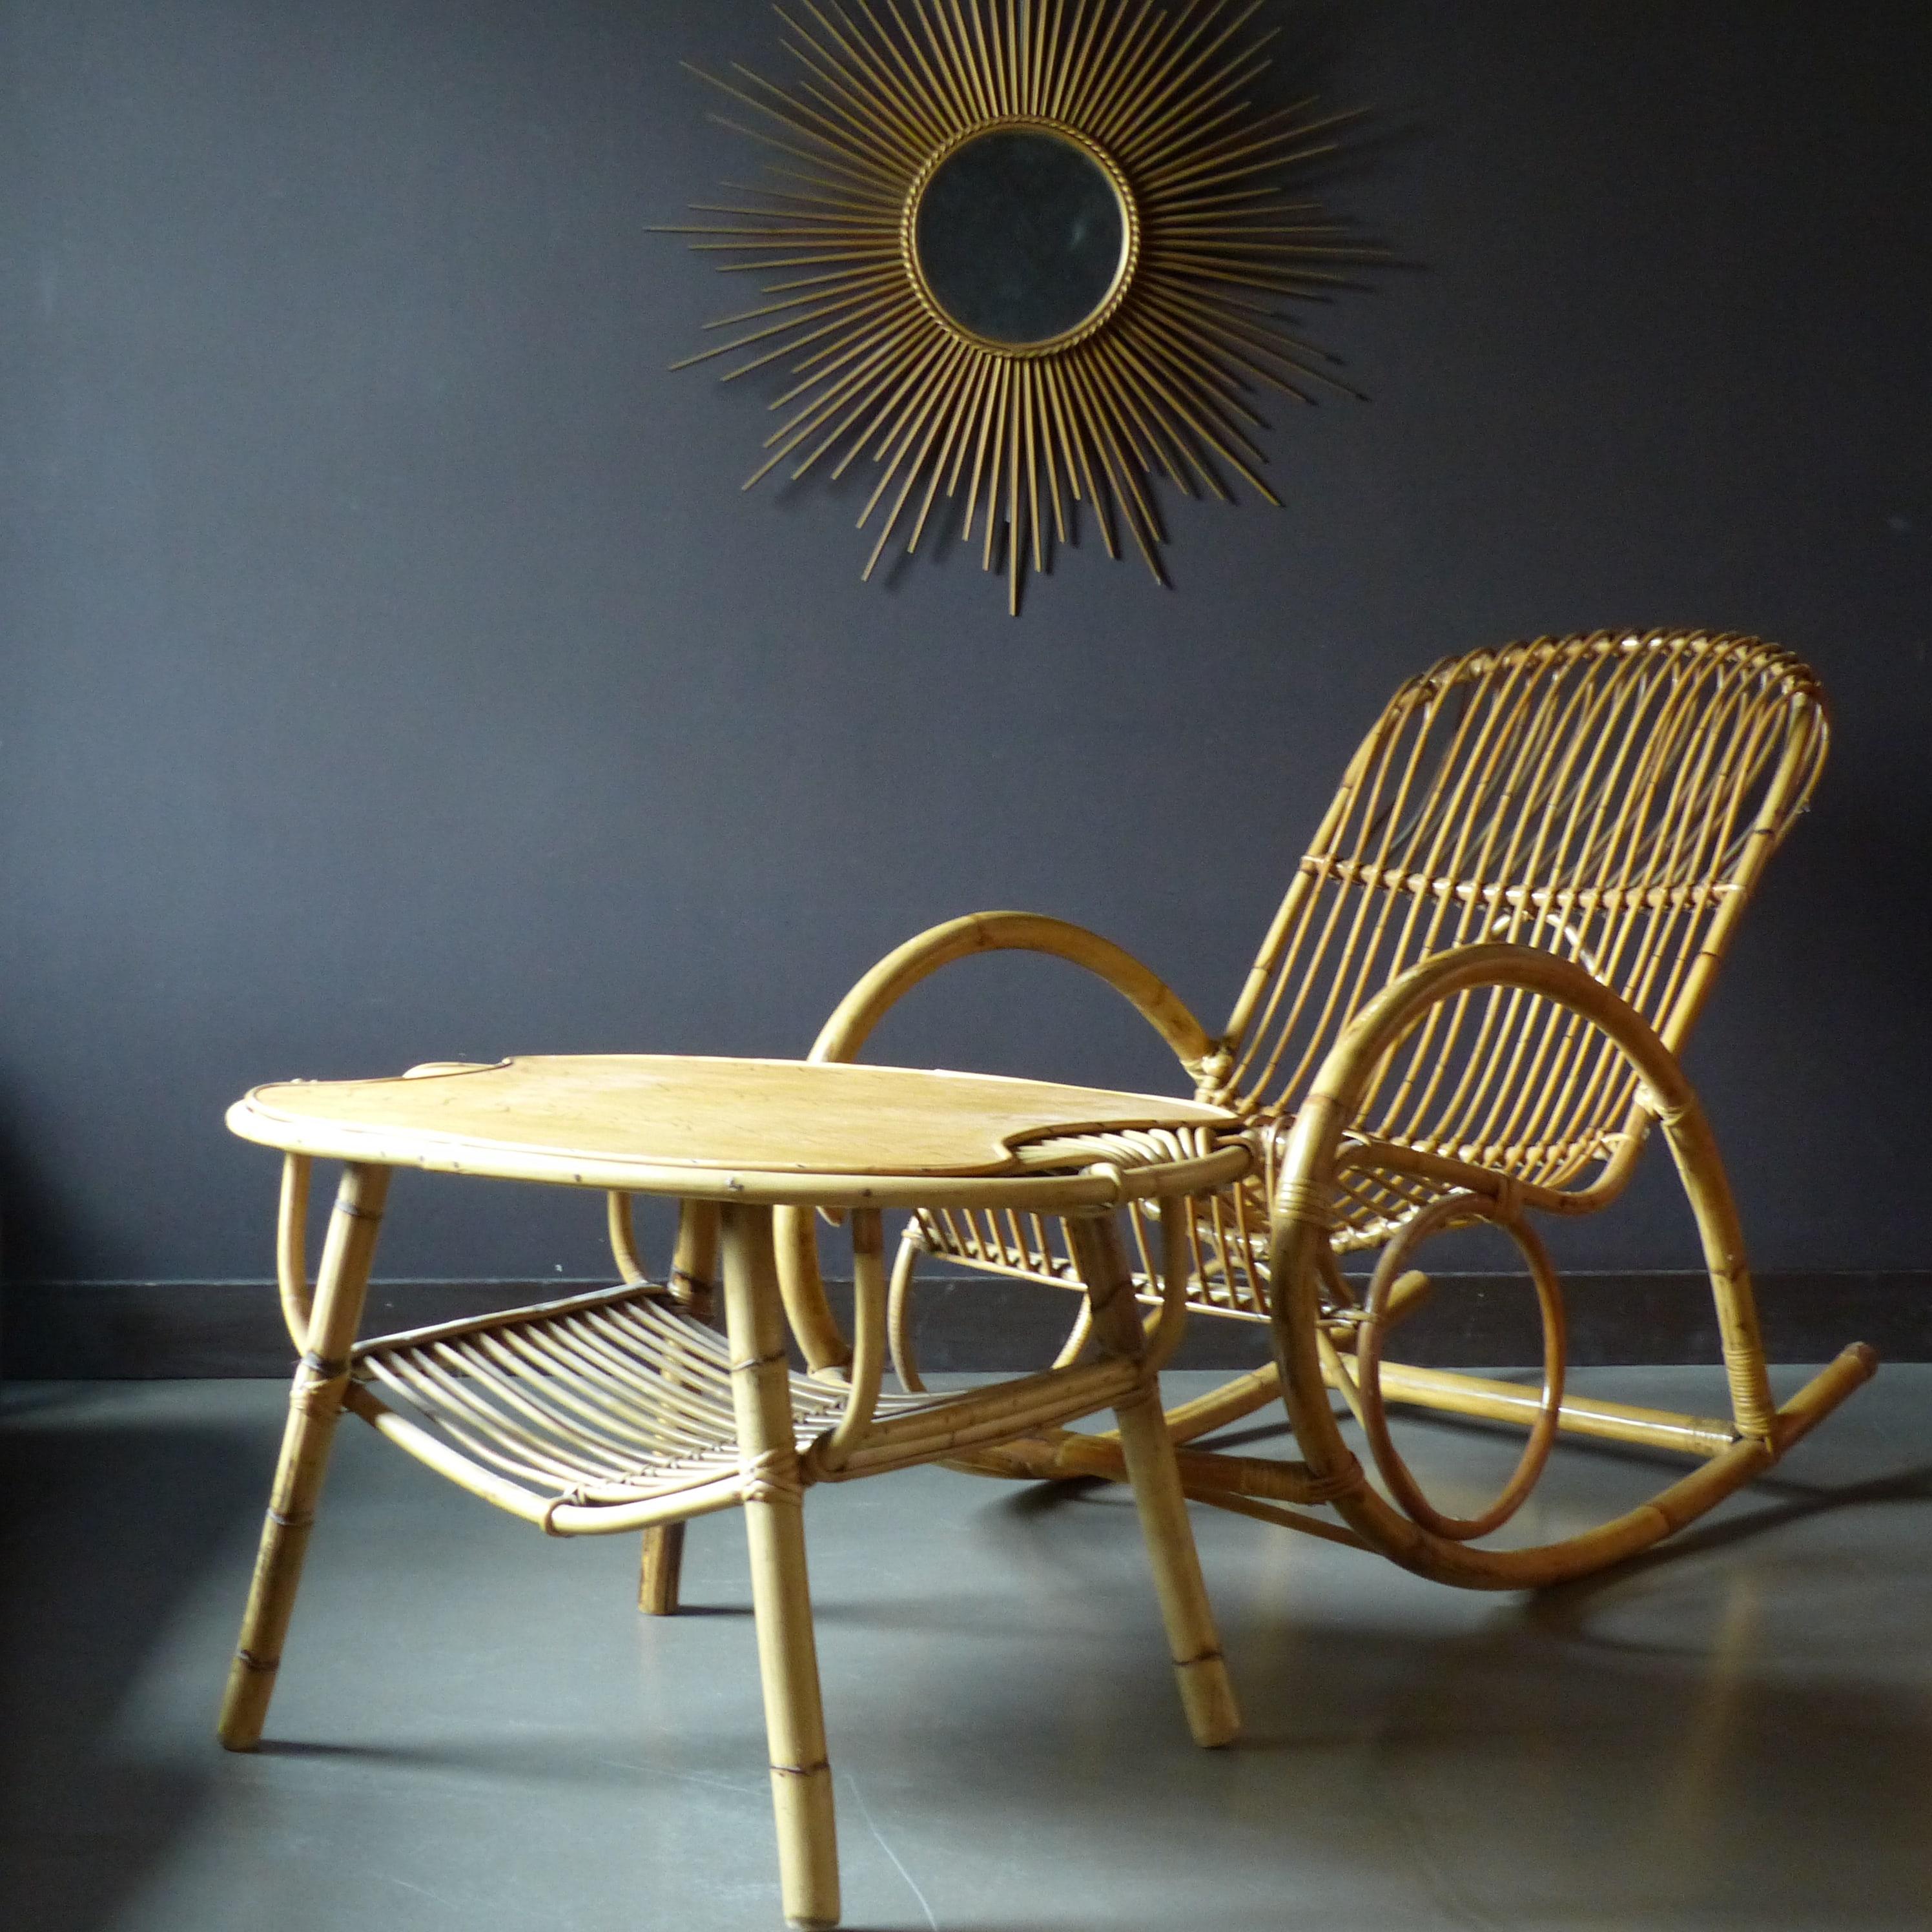 grand rocking chair en rotin lignedebrocante brocante en ligne chine pour vous meubles. Black Bedroom Furniture Sets. Home Design Ideas